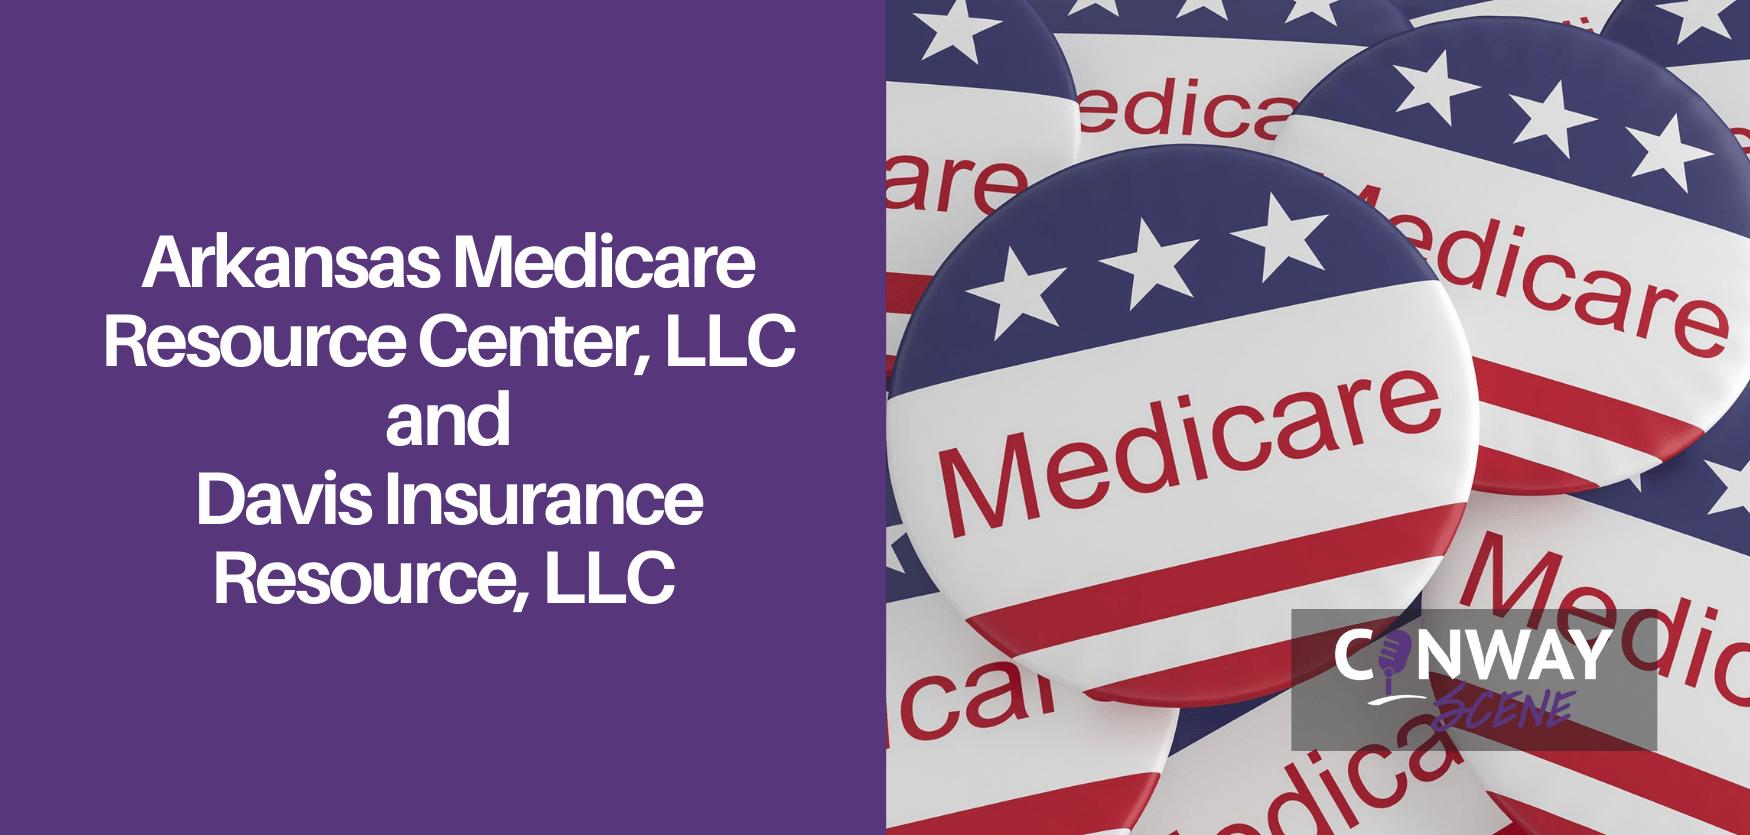 Arkansas Medicare Resource Center, LLC and Davis Insurance Resource, LLC